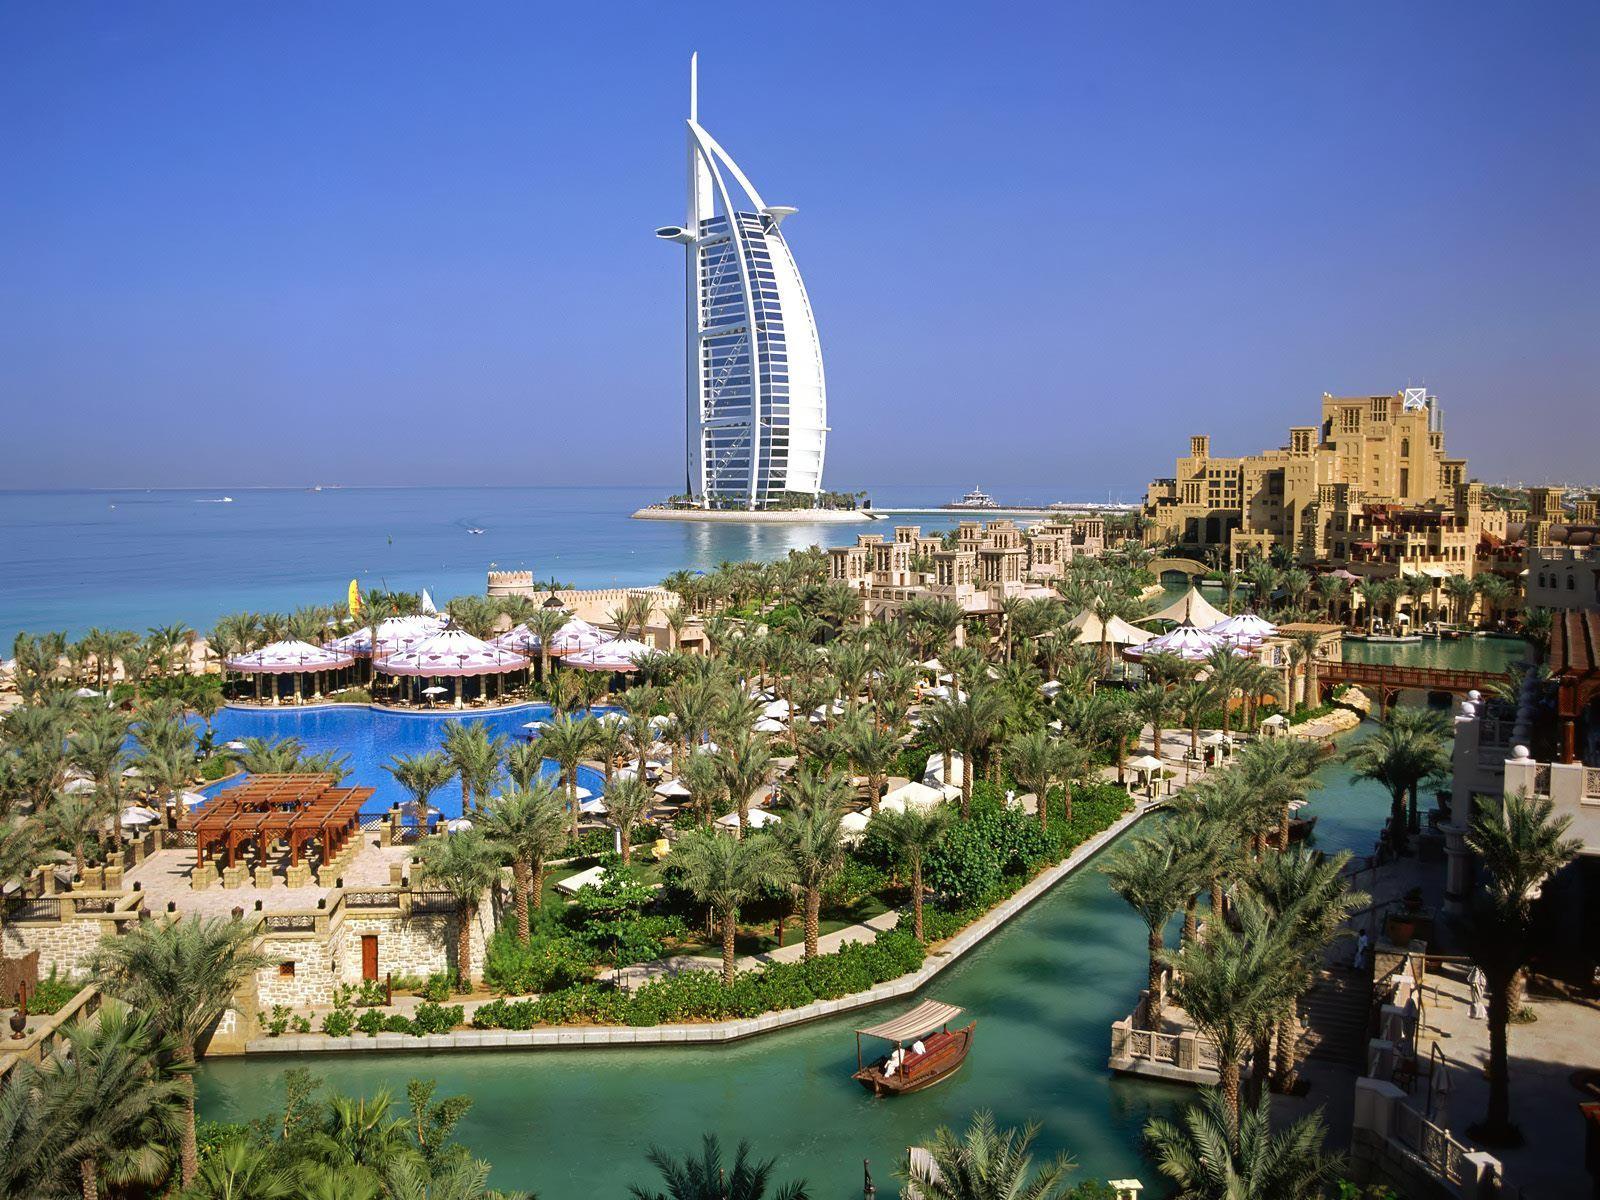 Burj Al Arab, Dubai - Travel Info and Travel Guide - Exotic Travel Destination